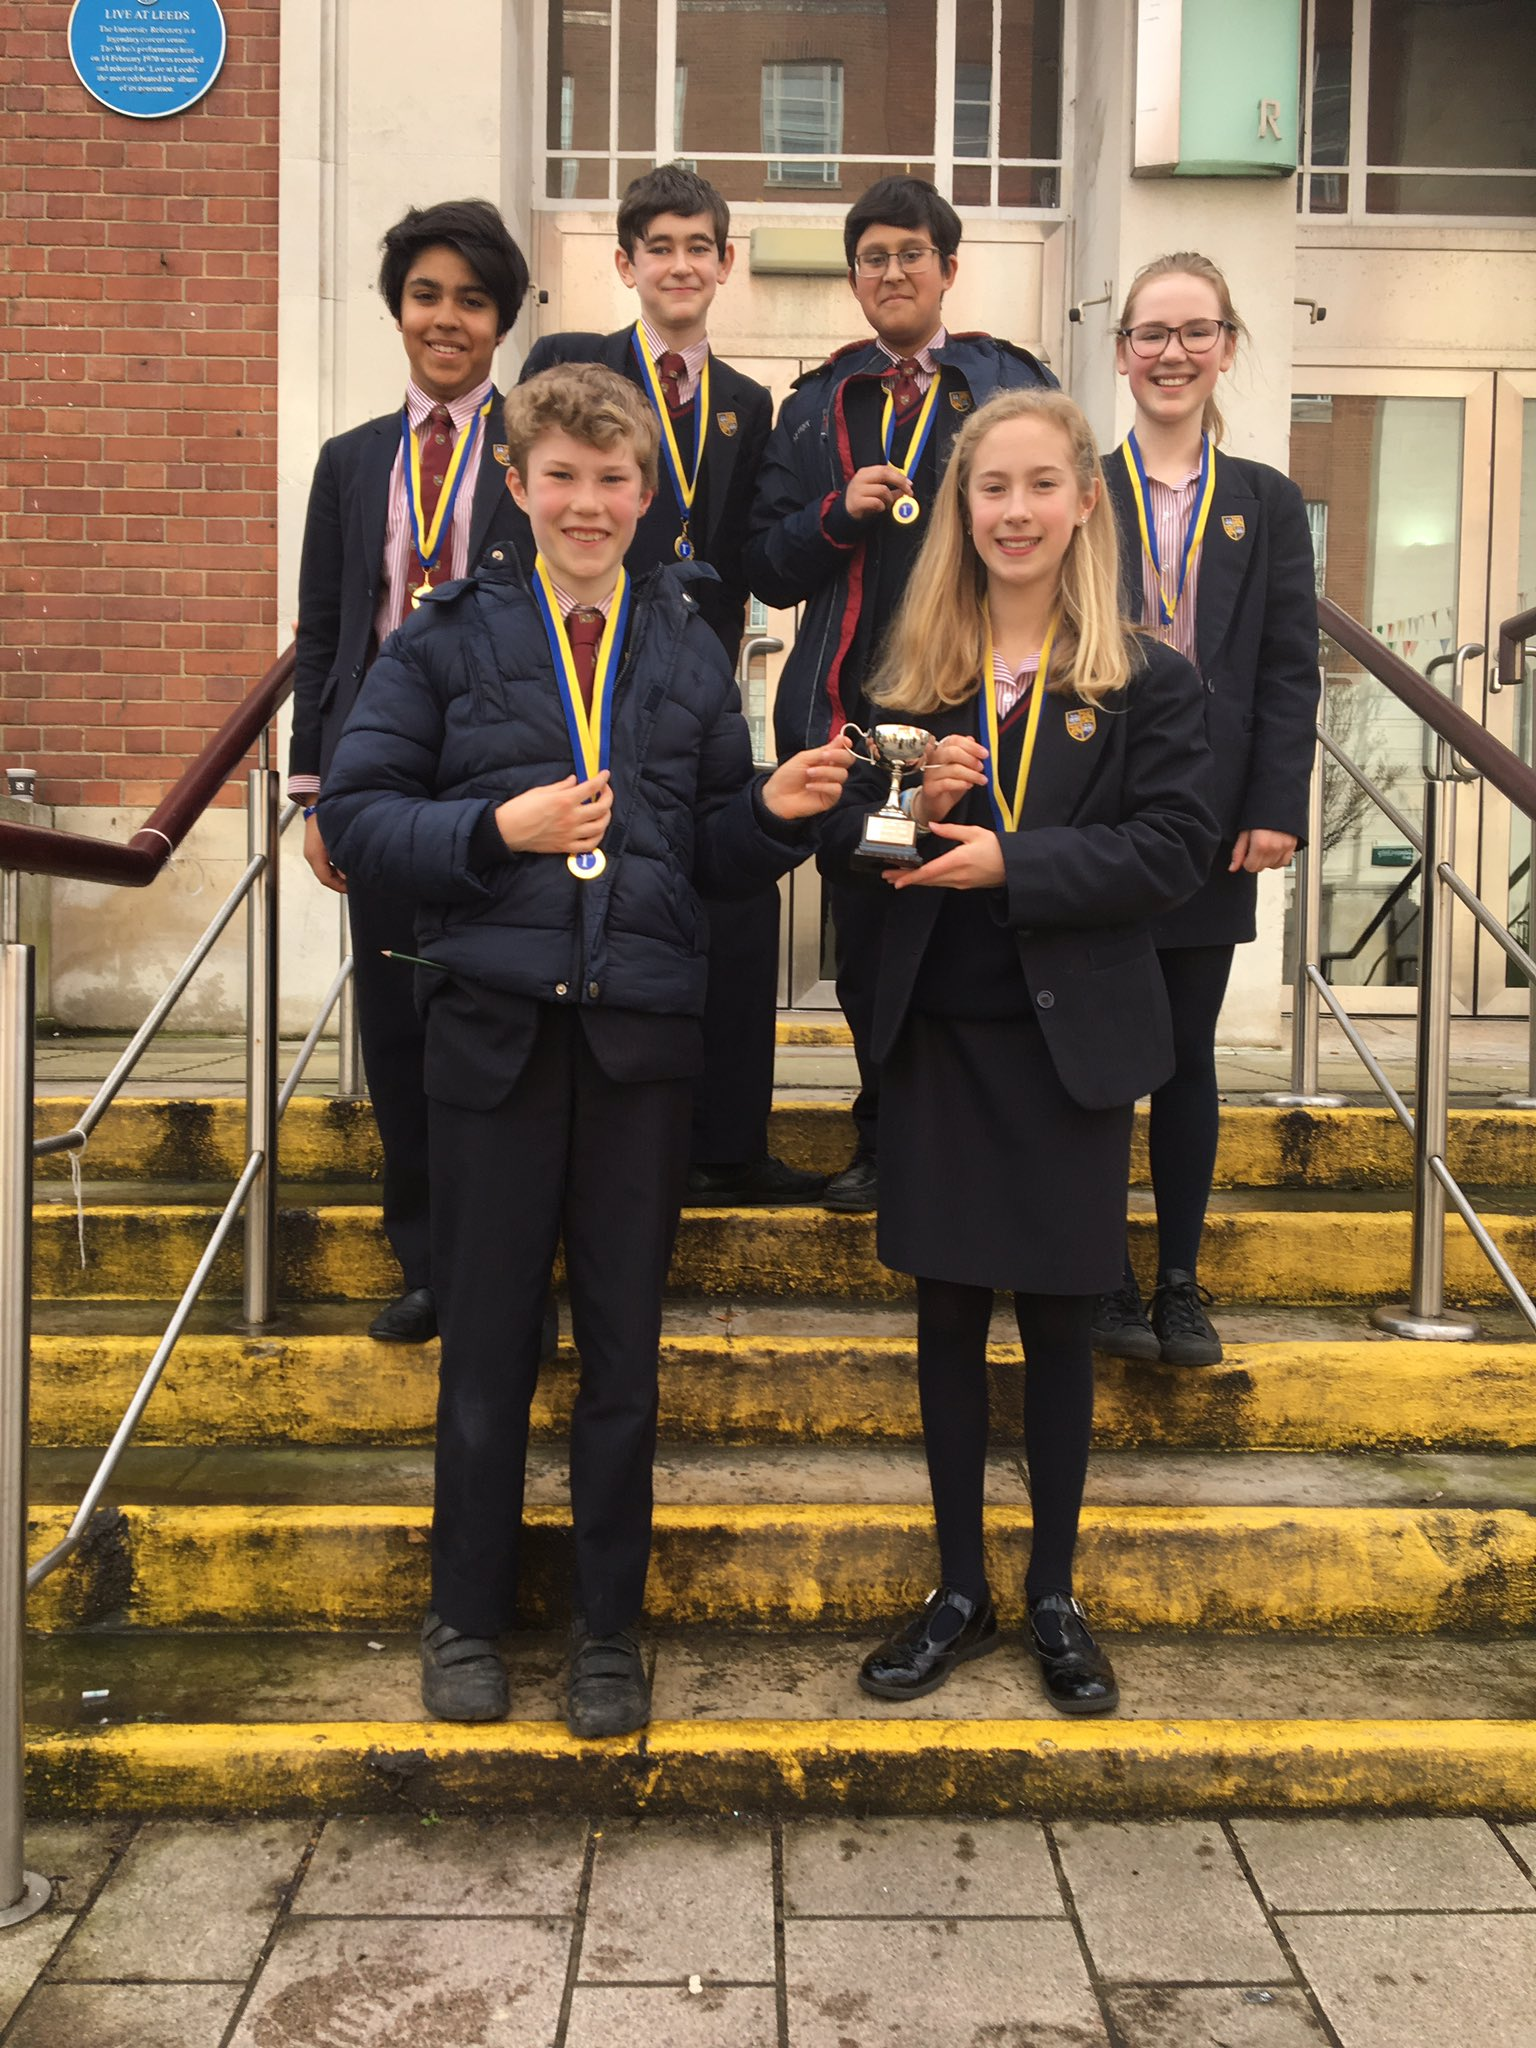 Congratulations BGS Maths Team ! Gold medal winners ! @BradfordGrammar https://t.co/CGsm38N1GI